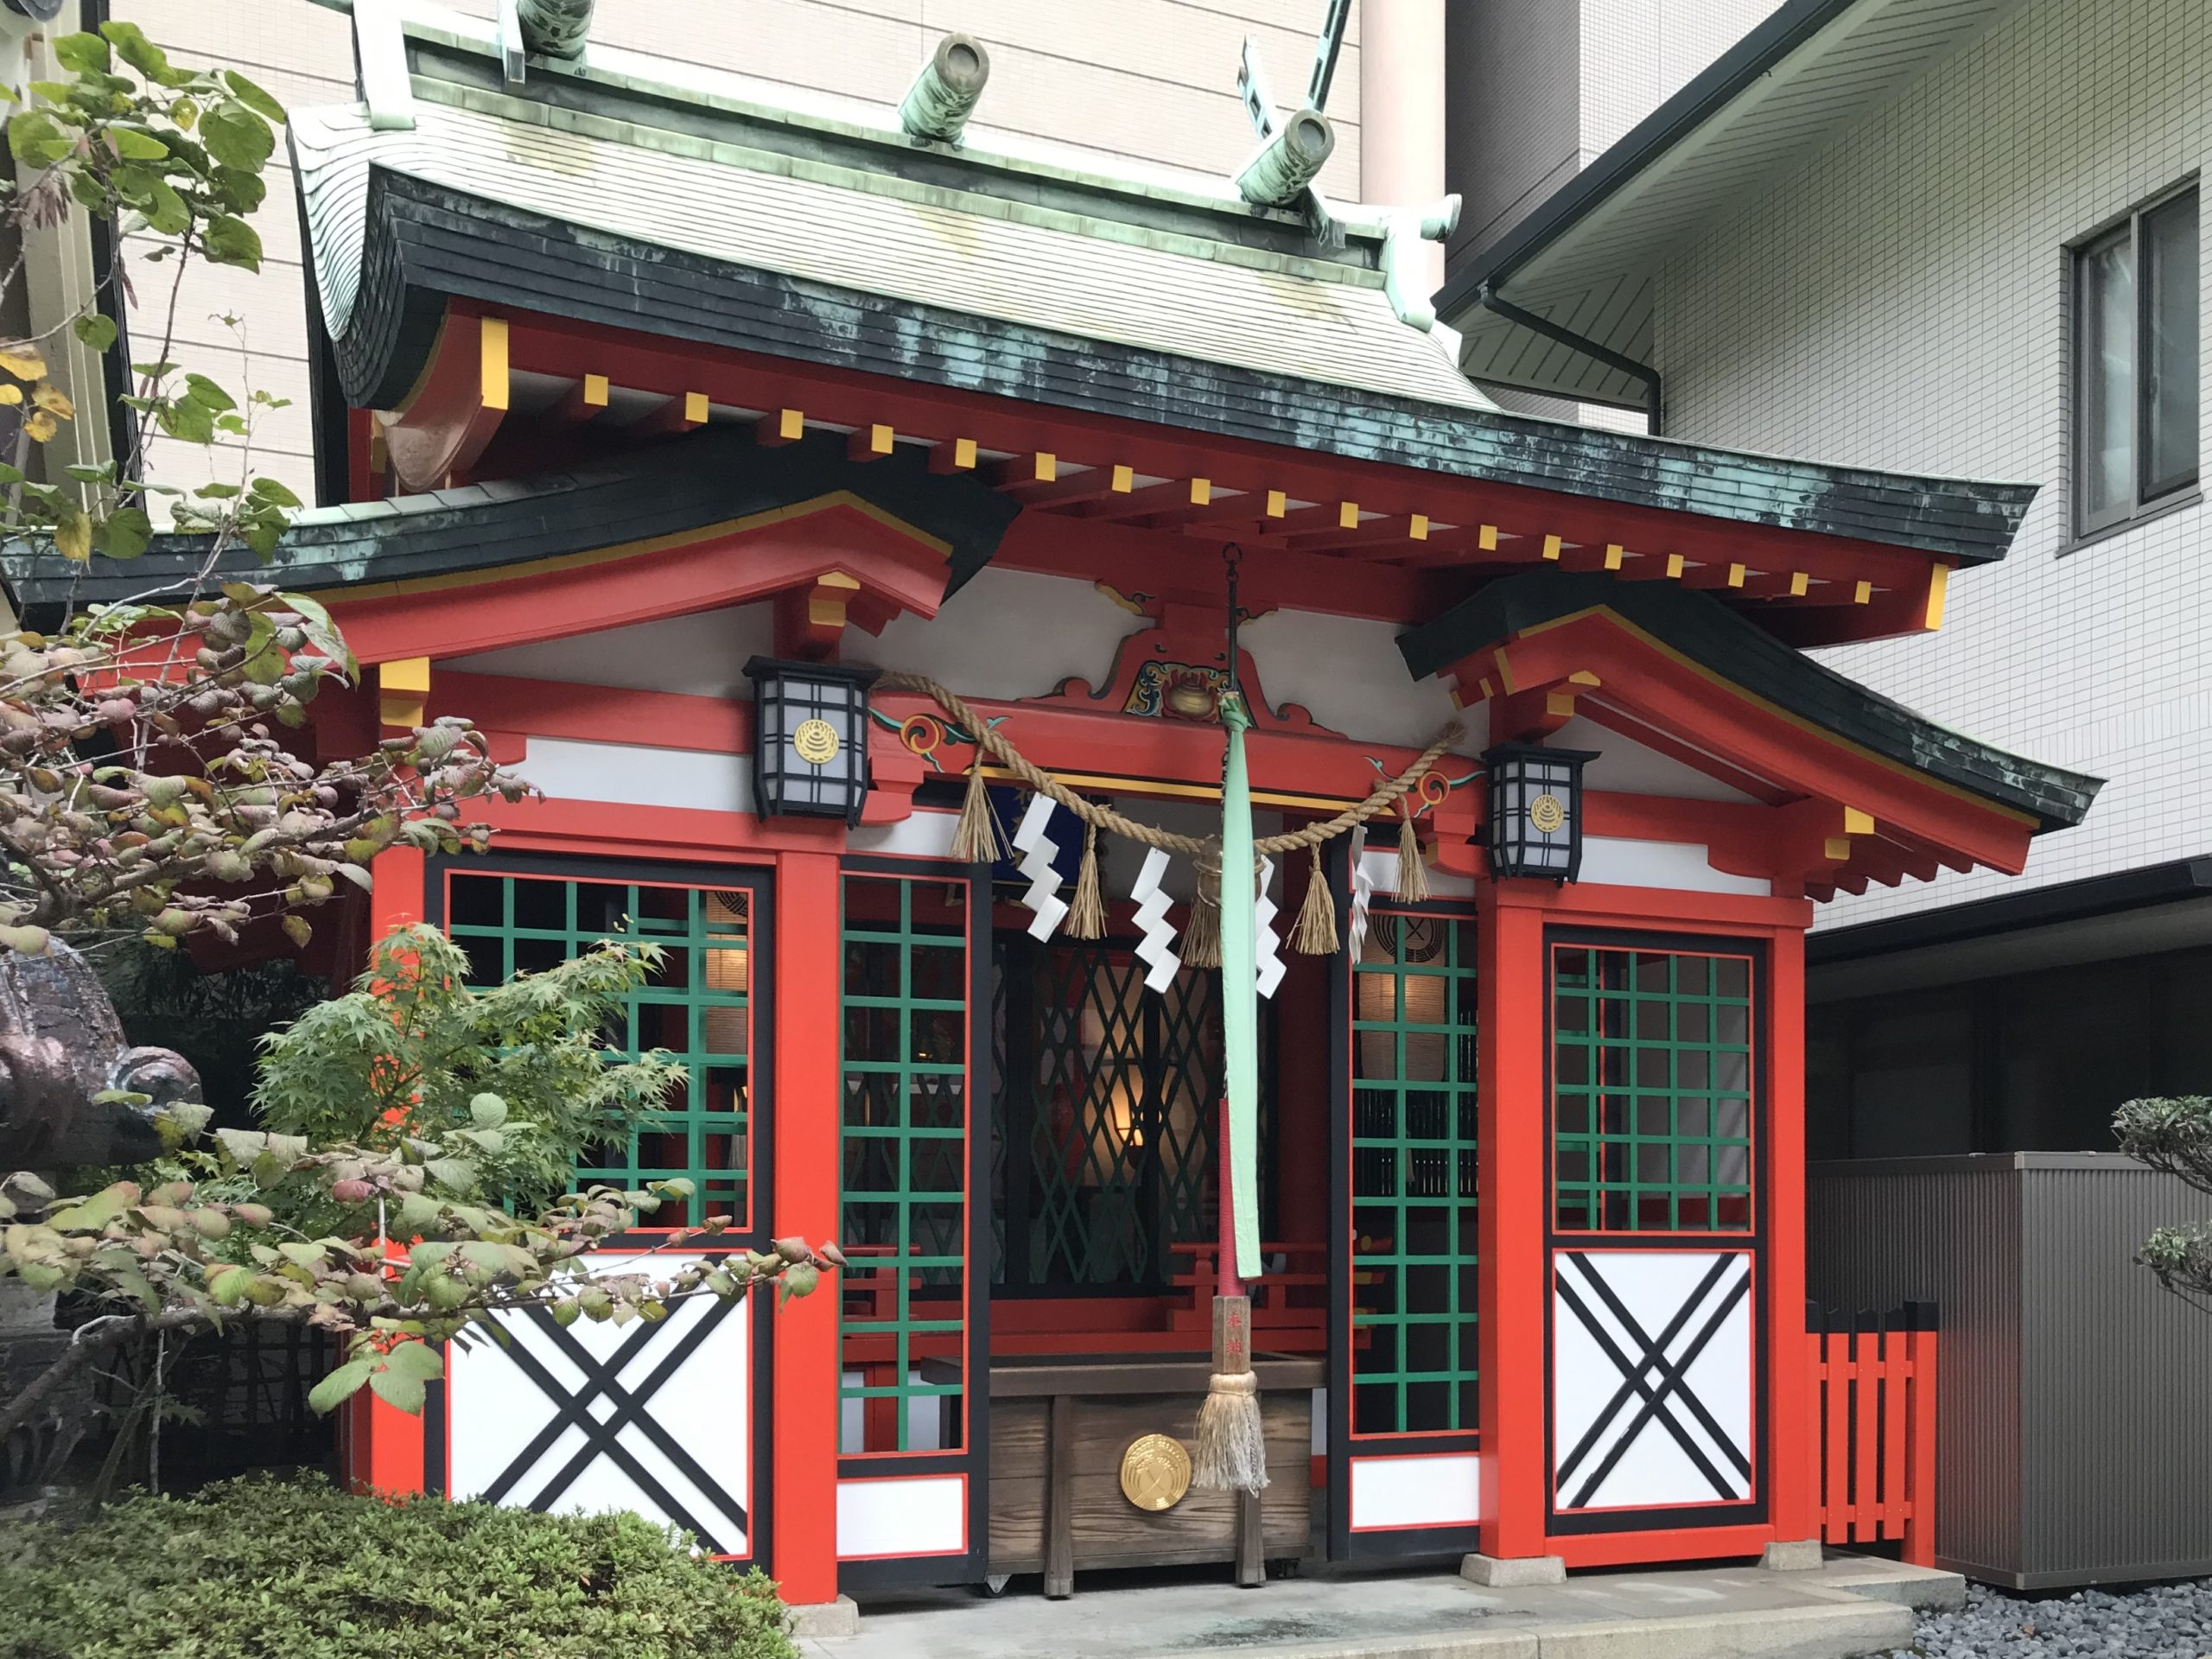 坐摩神社の稲荷神社で商売繁盛祈願